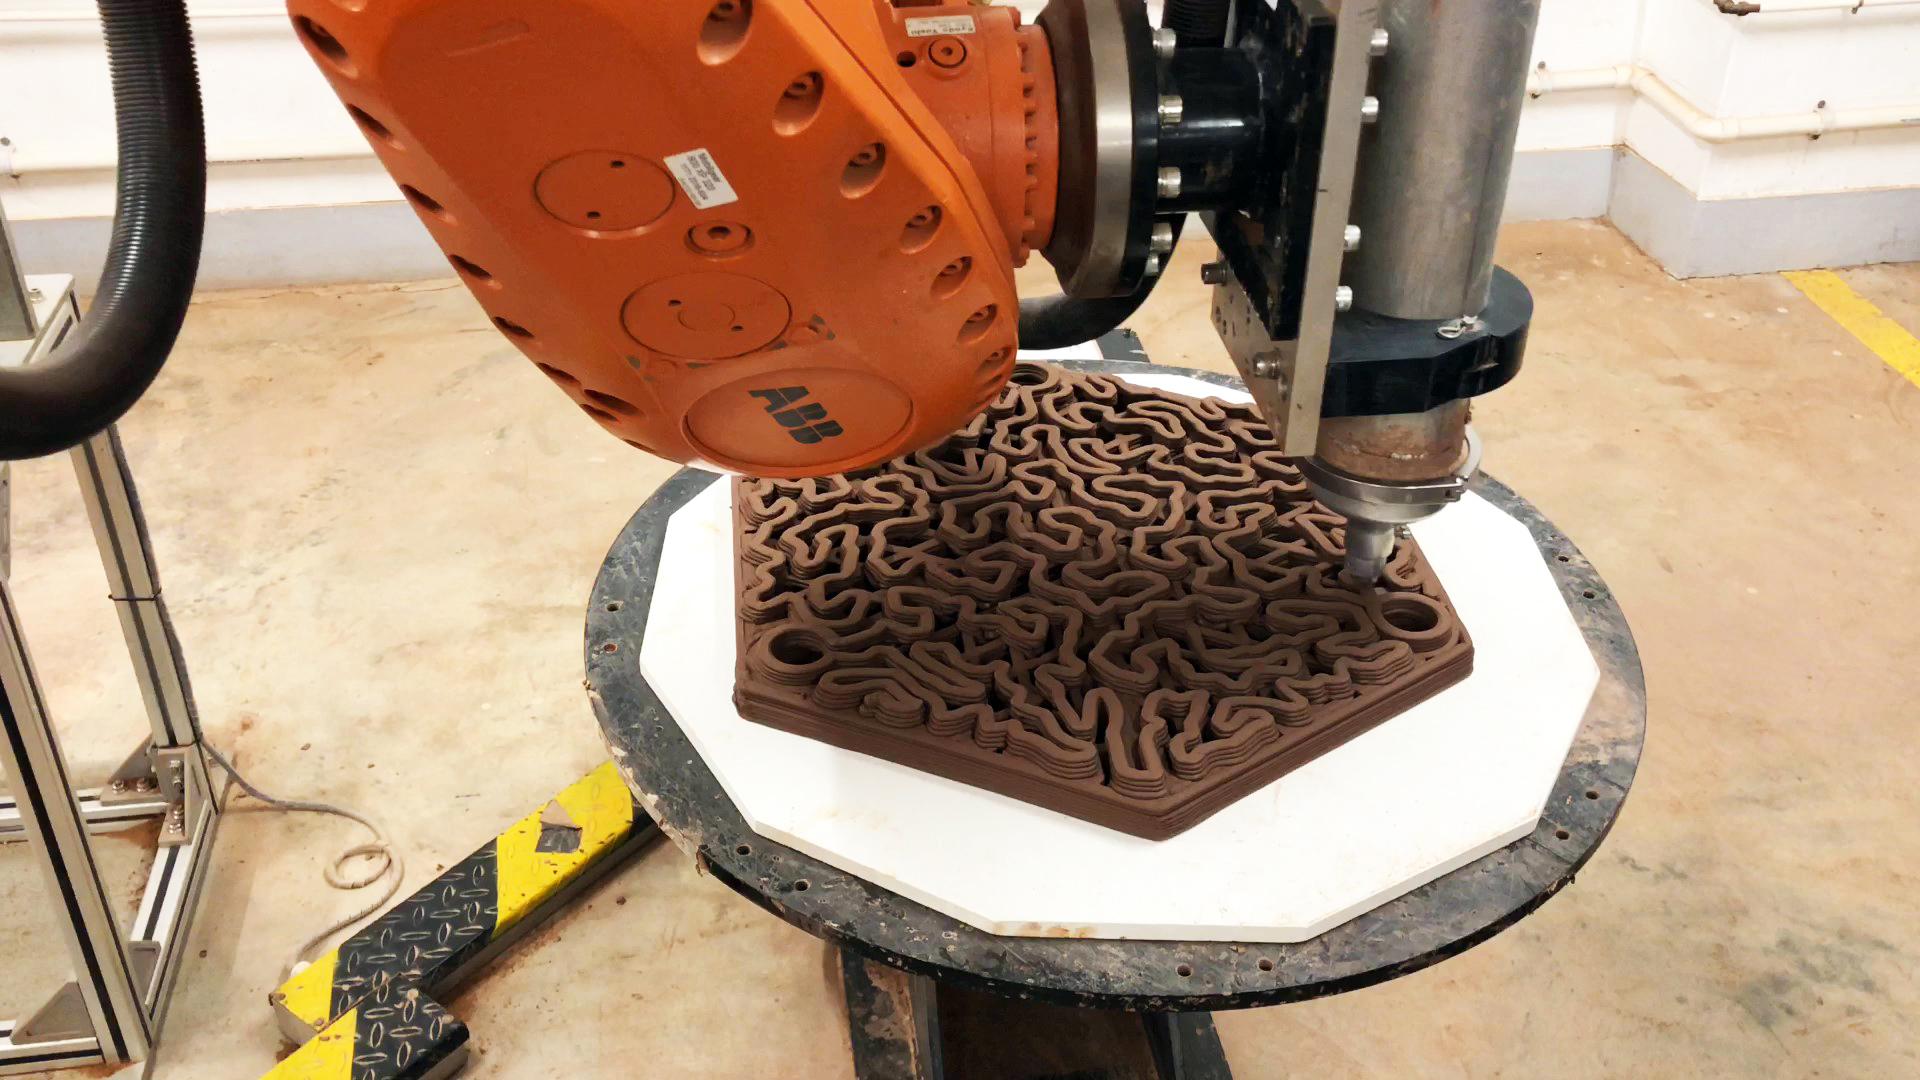 Terracotta tile 3D printed using a 3D Robotic Clay printer. Photo via Hong Kong University.